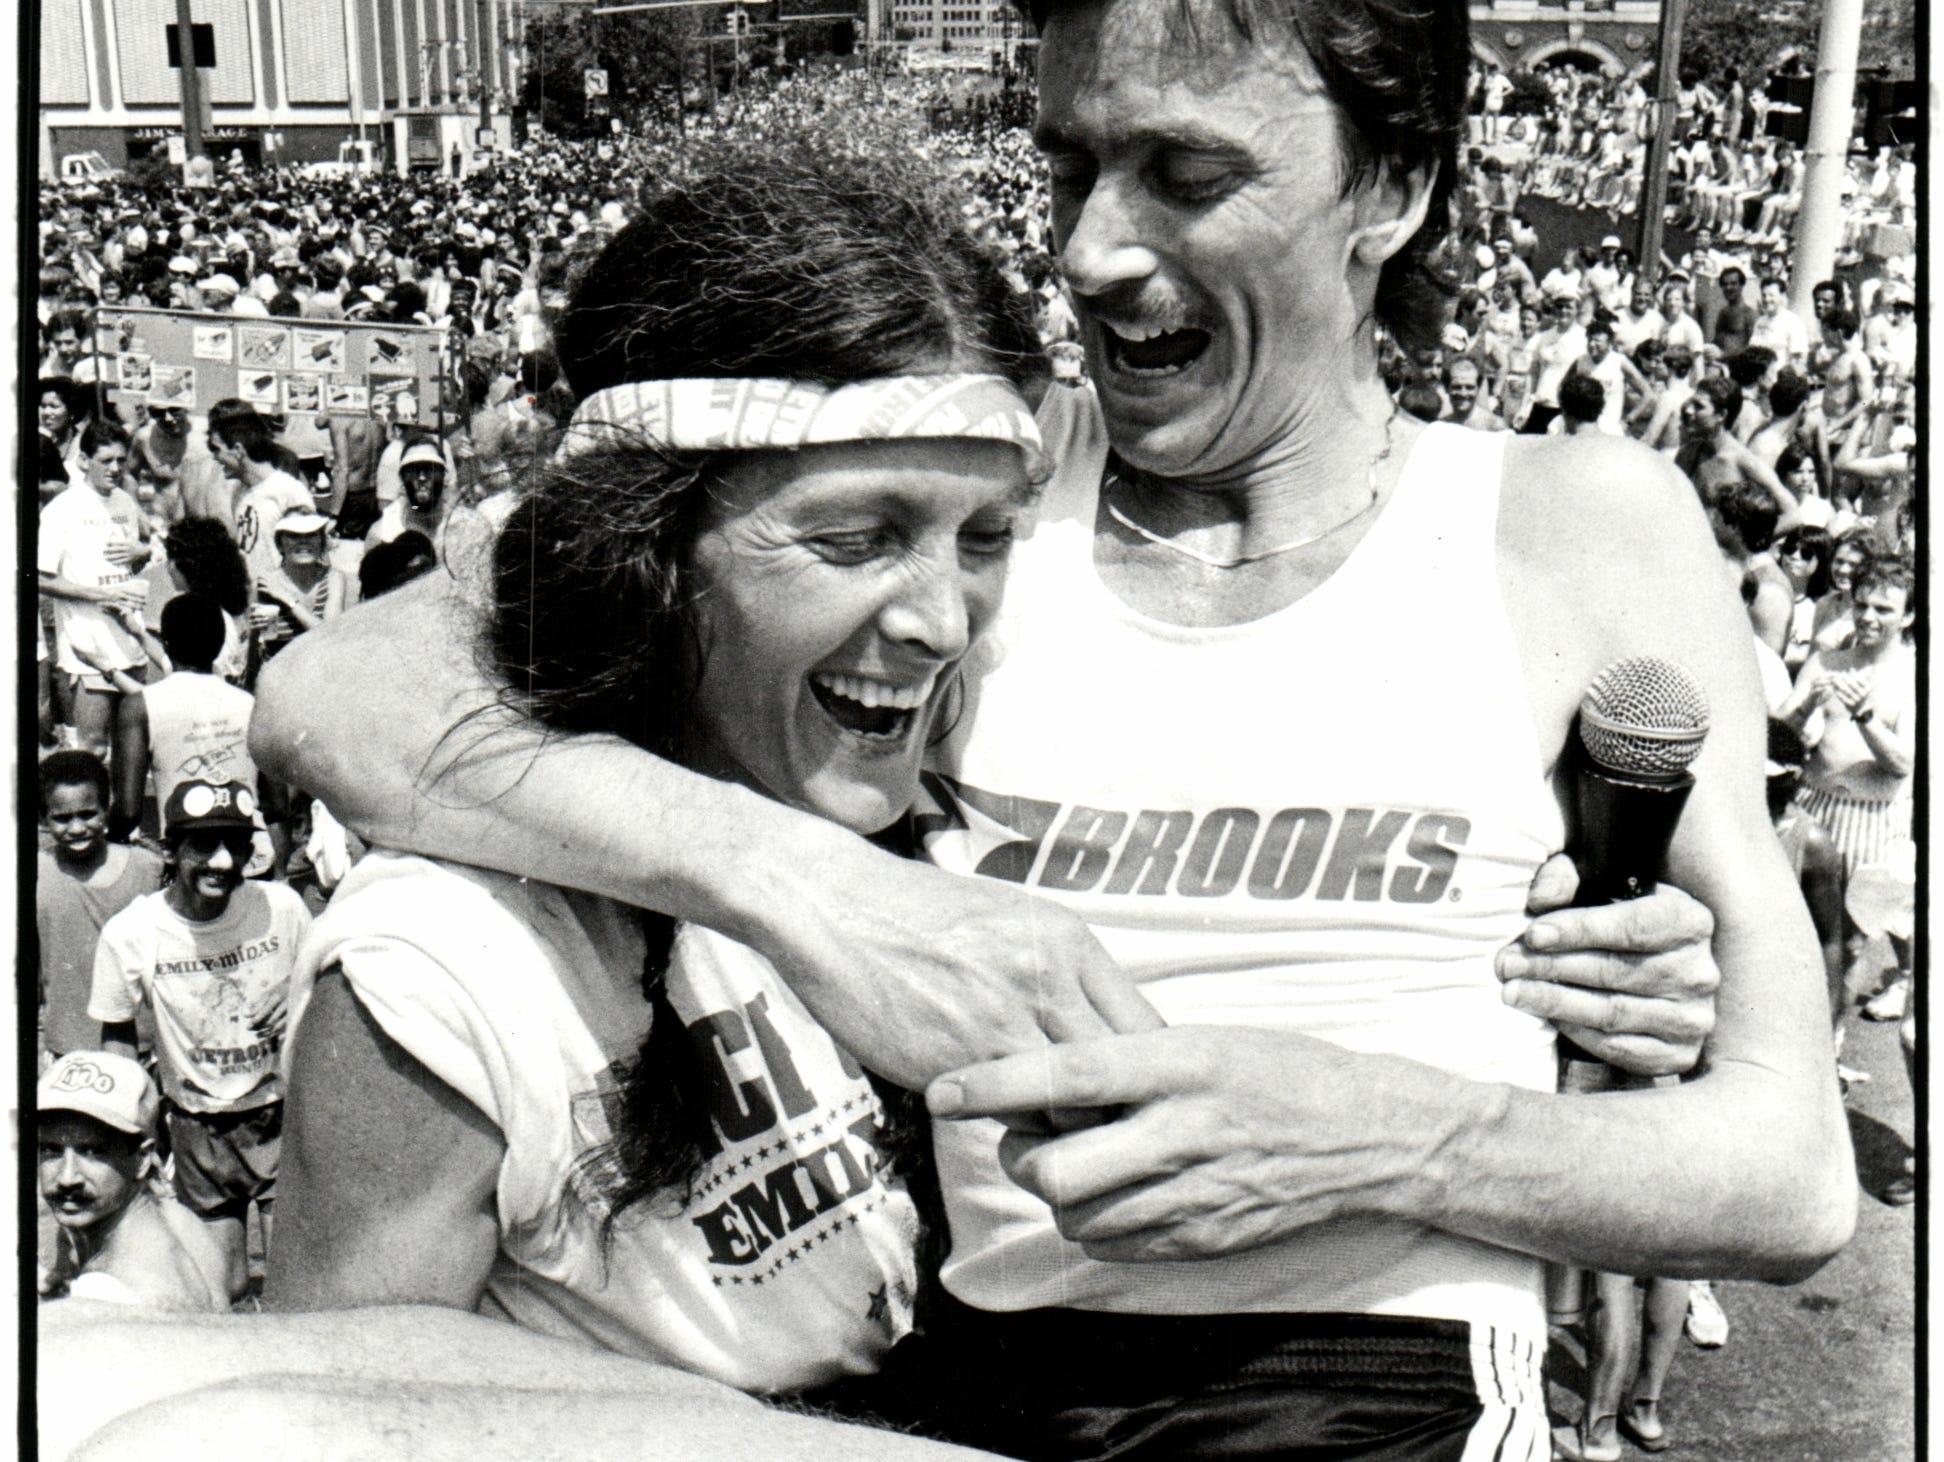 Detroit Free Press marathon winners react after the race in 1984.